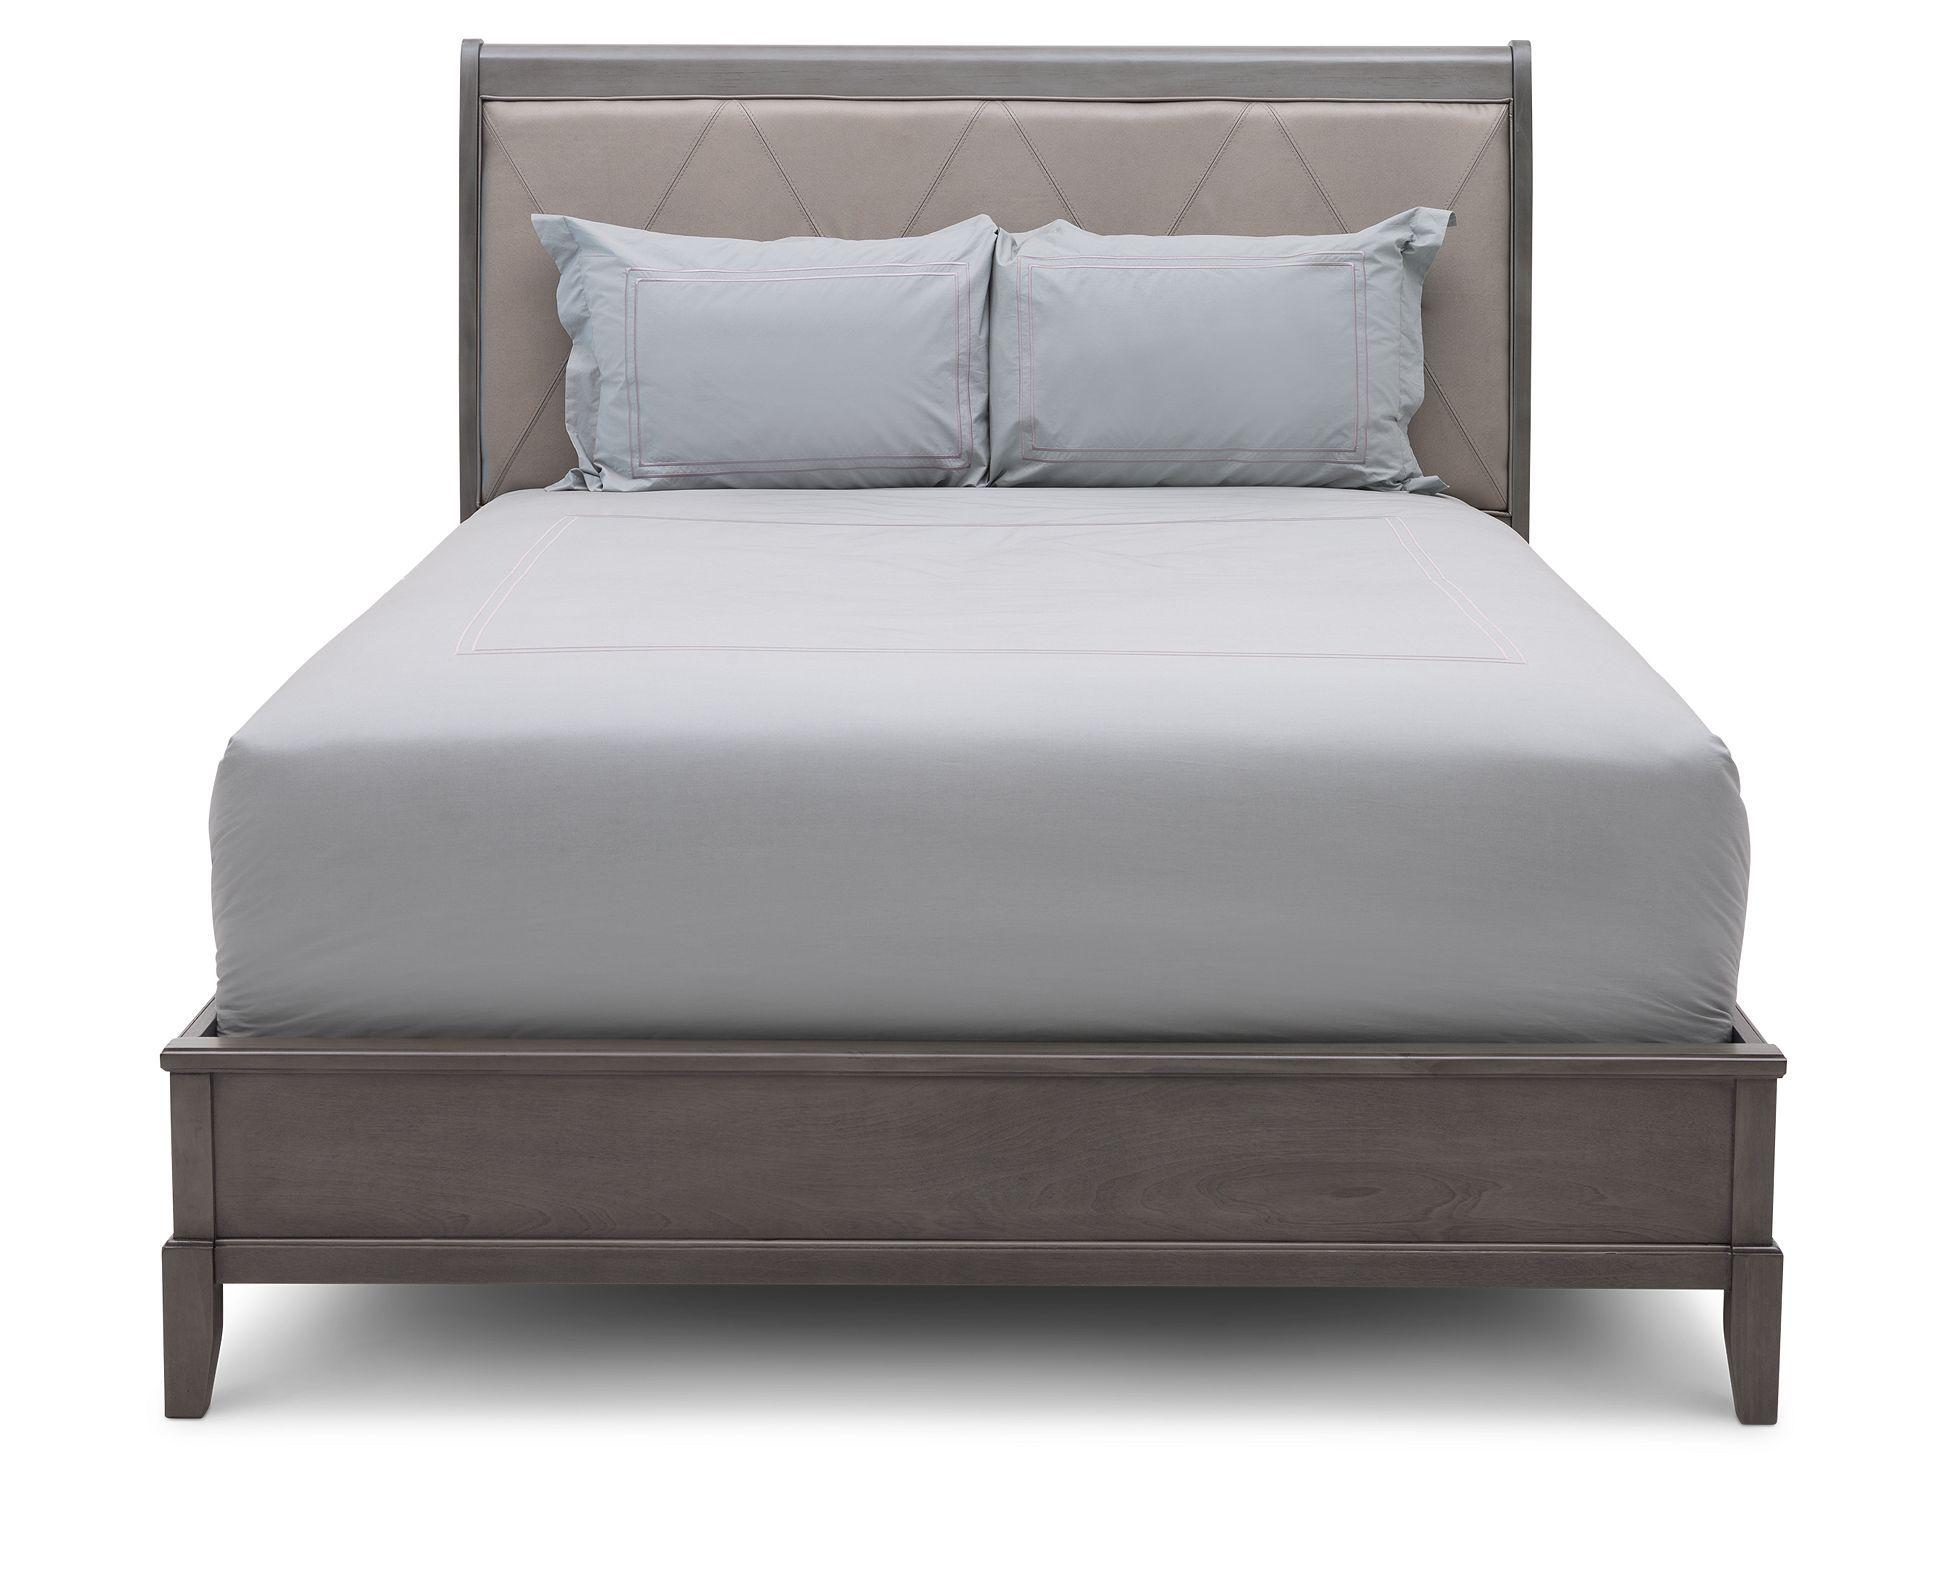 10696aac68c3a Dupont Tufted Upholstered Platform Bed - Queen - Dark Gray - Sleep  Revolution